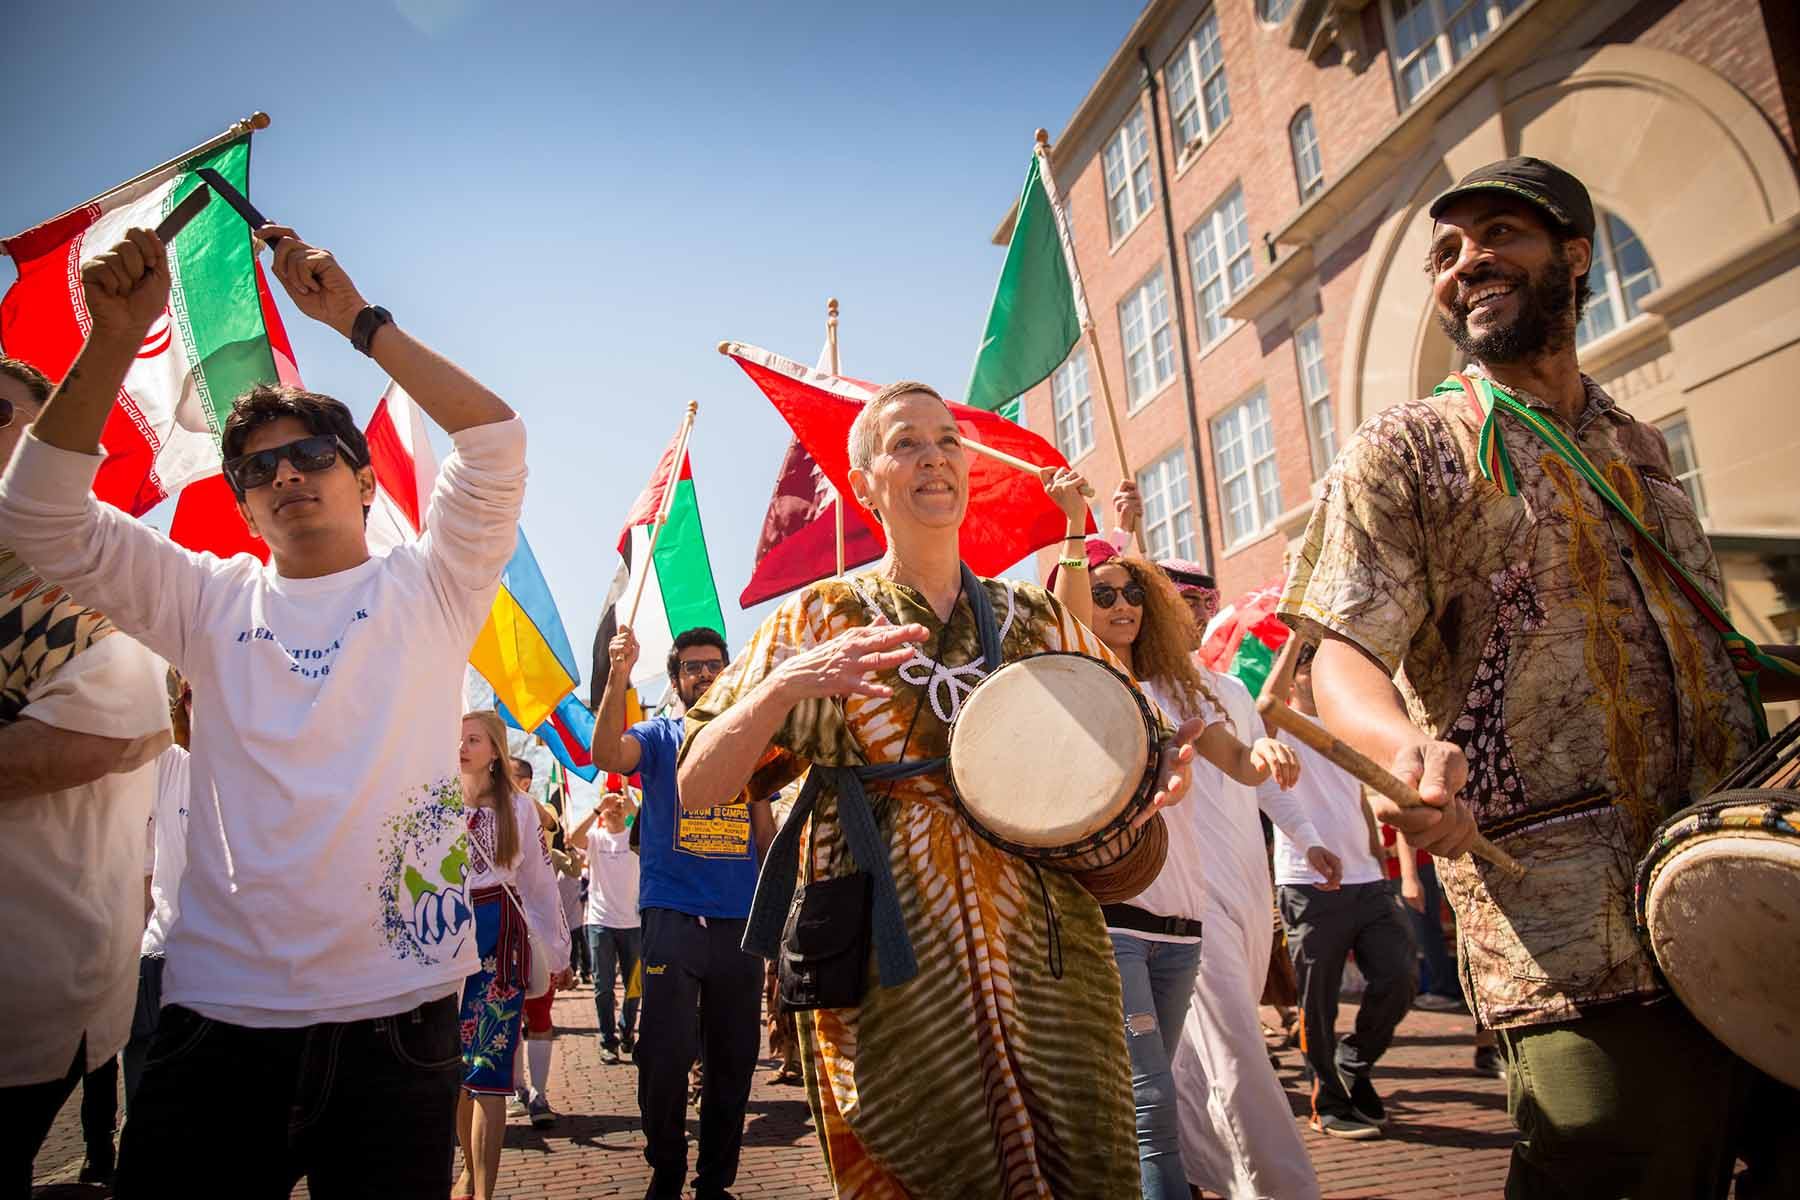 Participants in the annual International Street Fair parade